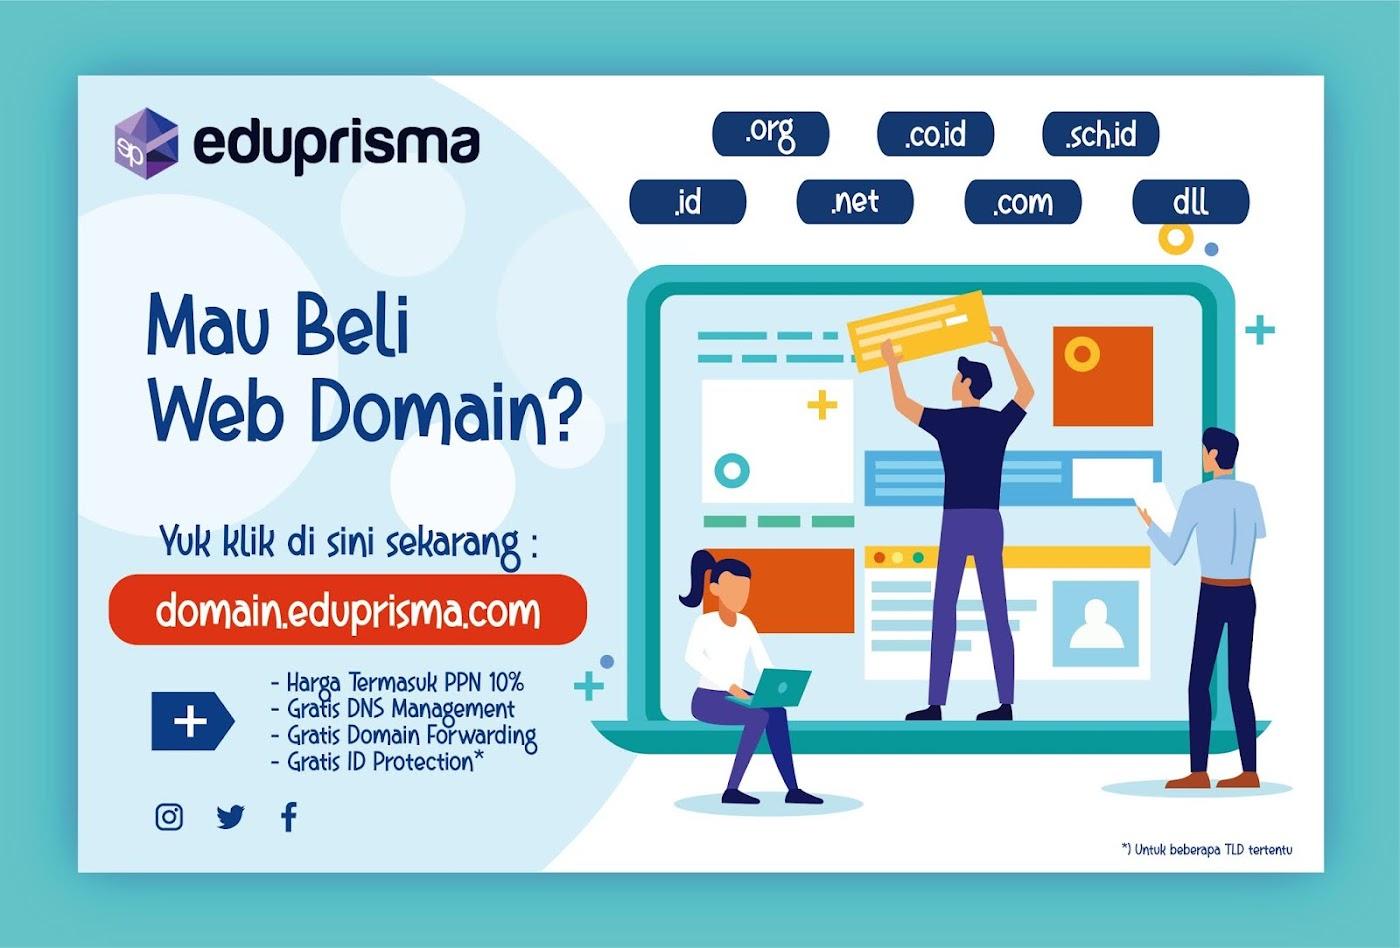 Eduprisma Web Domain & Hosting